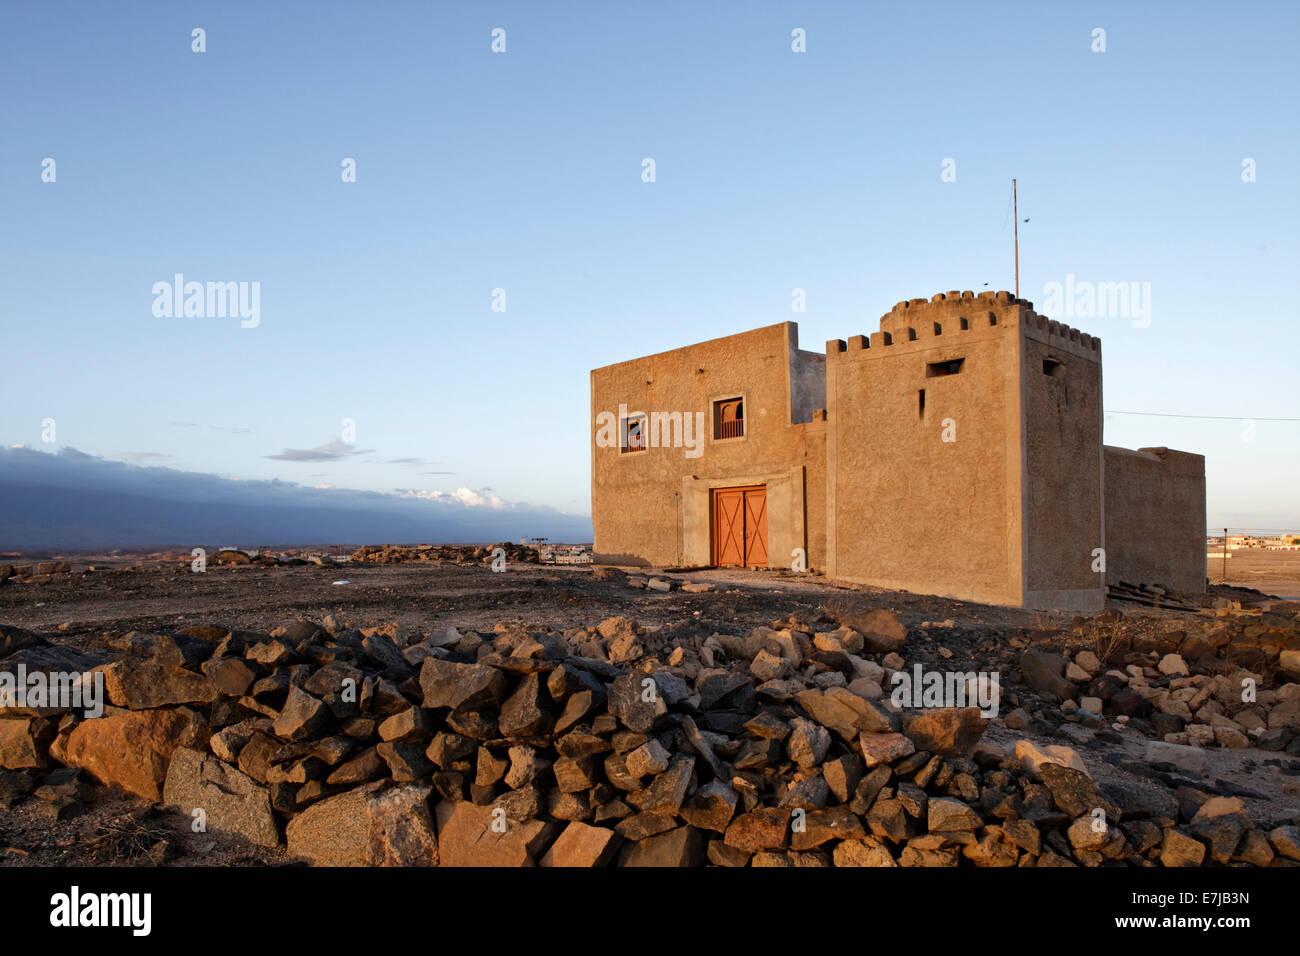 Fort, fortification, Mirbat, Dhofar region, Sultanate of Oman, Arabian Peninsula - Stock Image